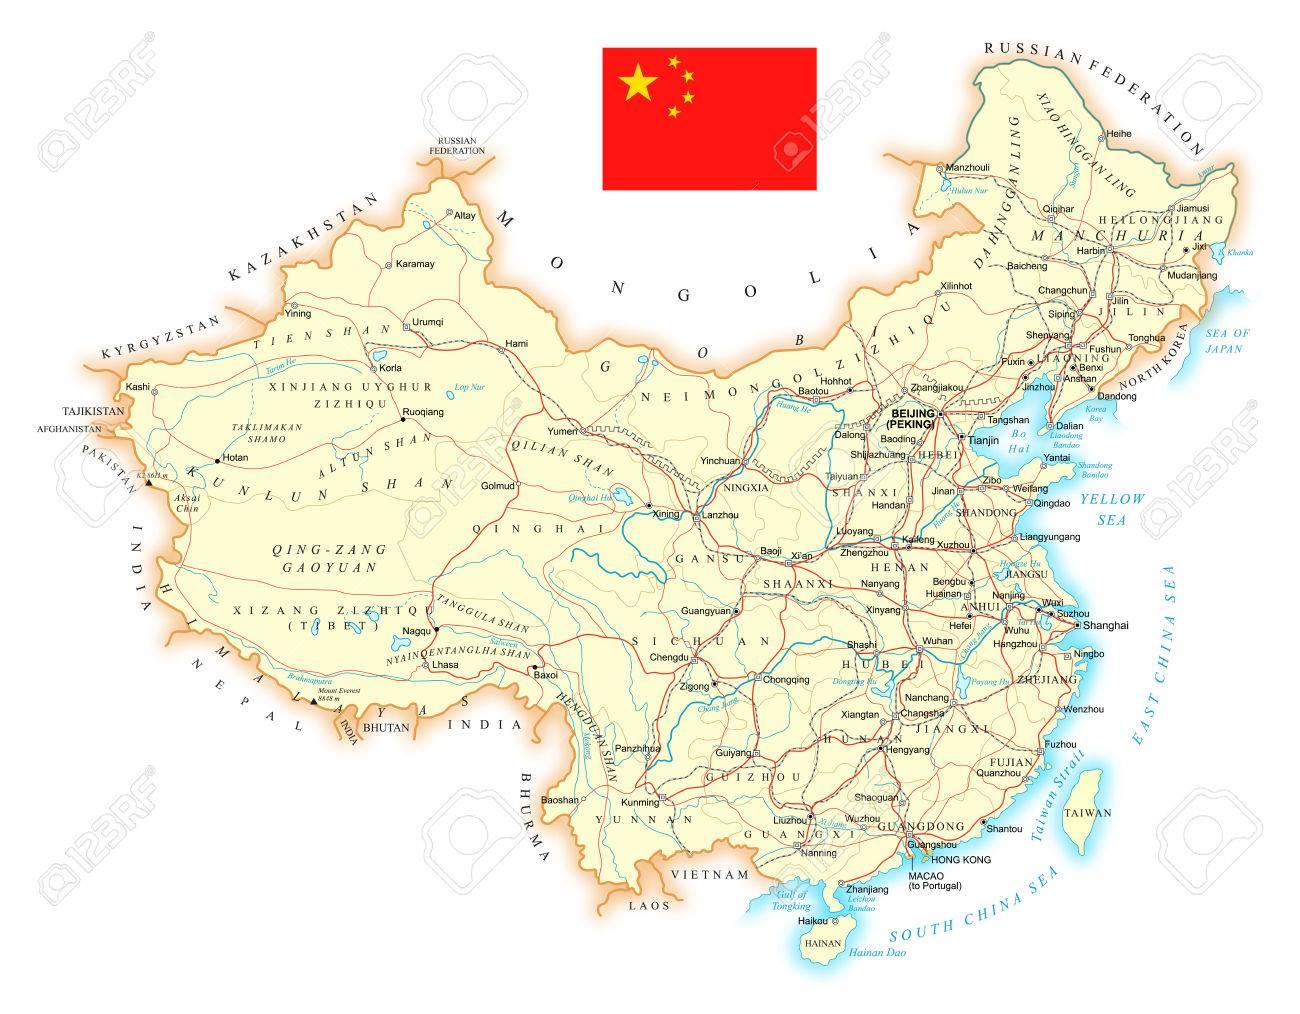 topographische karte china China   Große Detaillierte Straße Topographische Karte   Vektor